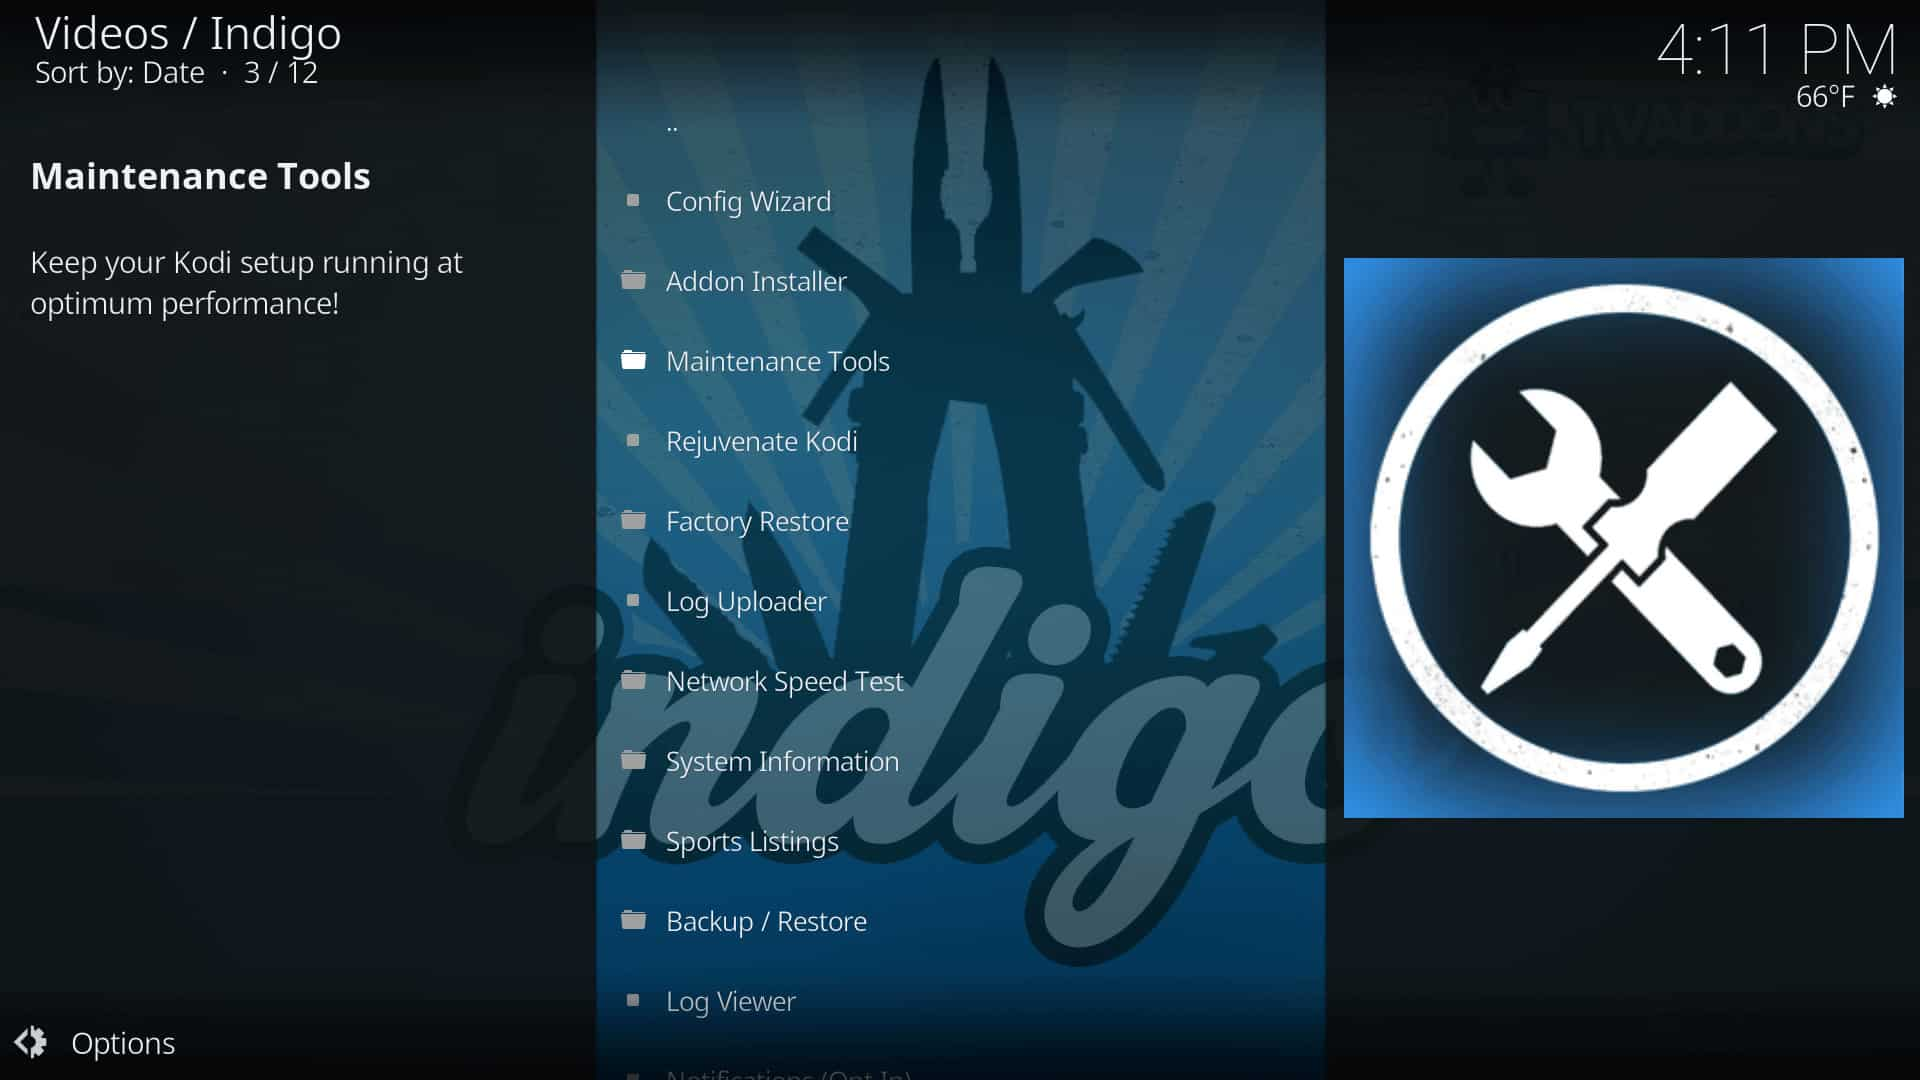 Install Indigo Addon on Kodi - Maintenance, Streaming, and more